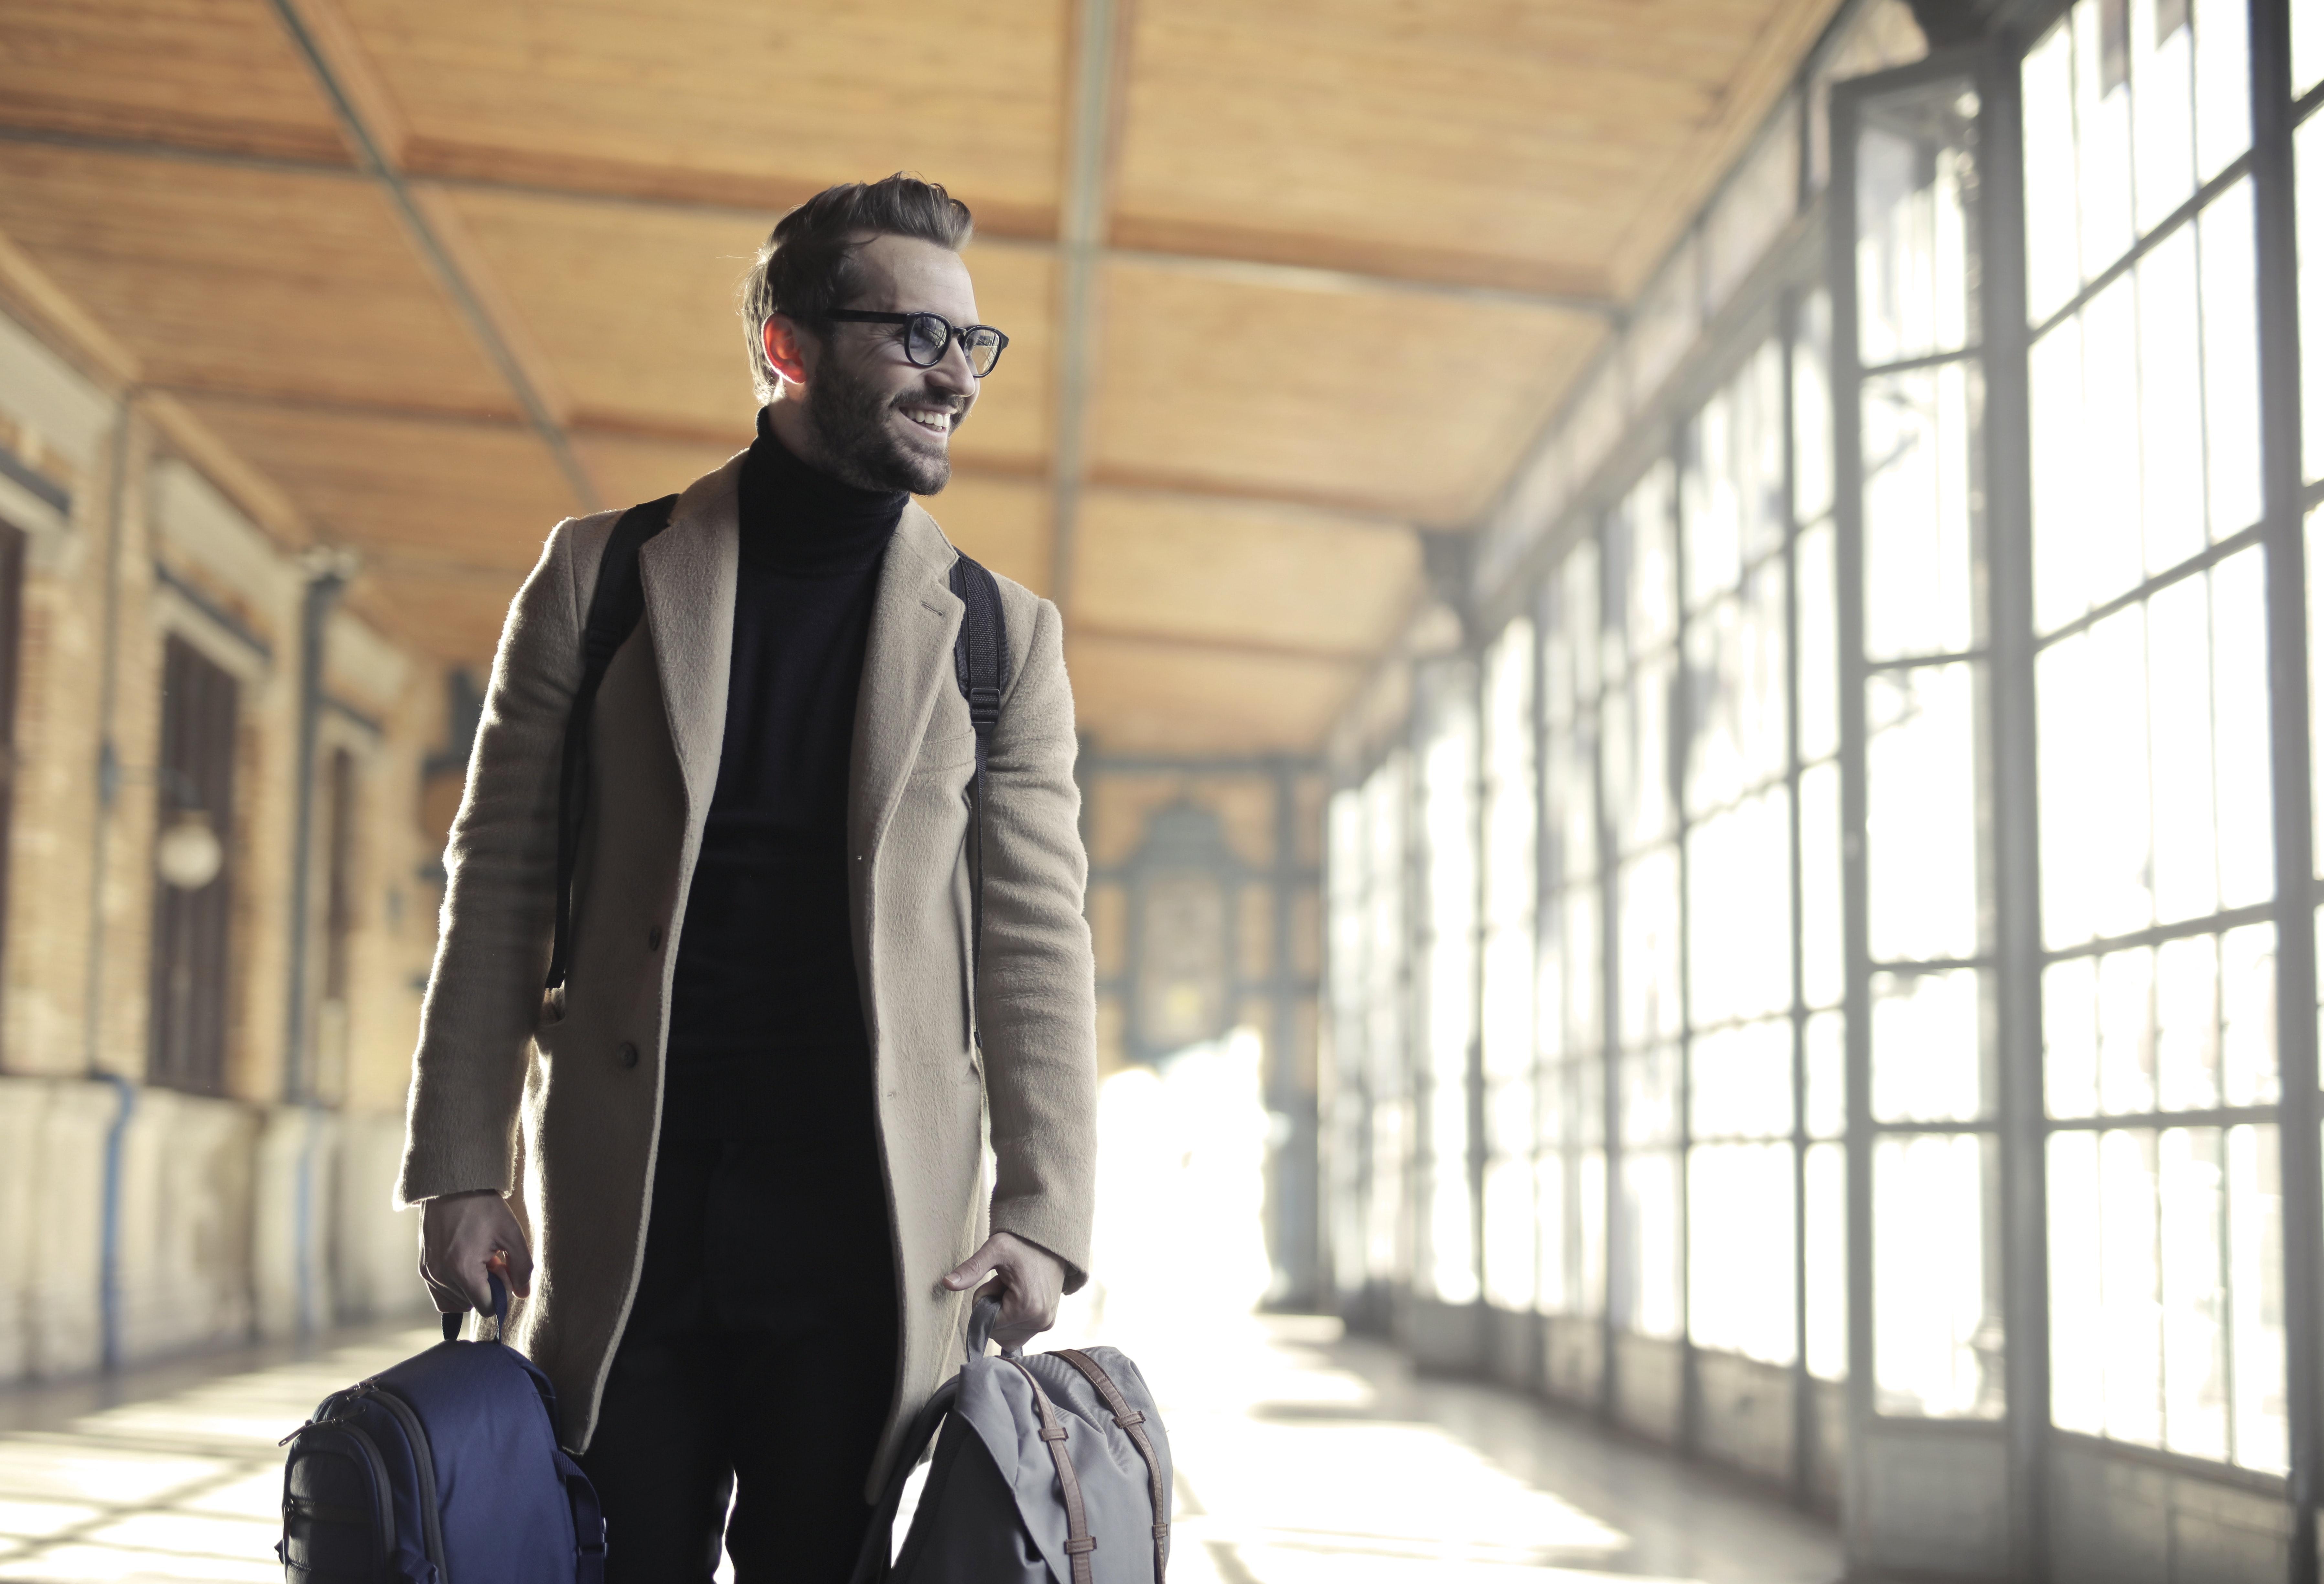 business backpacks for travel